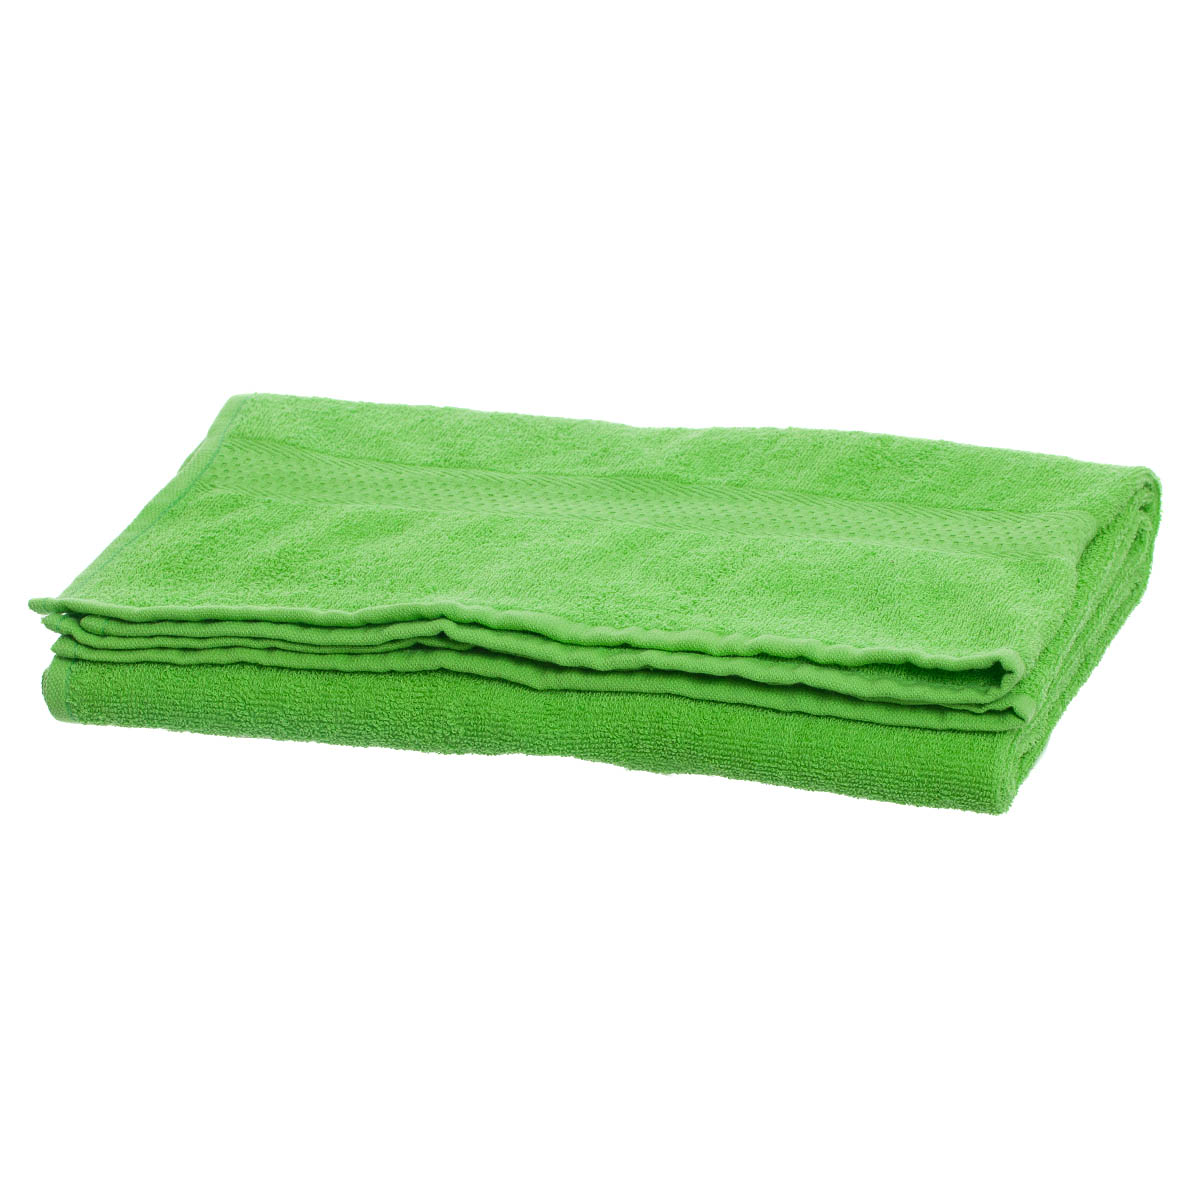 Махровое полотенце 30х60 Марьины узоры, УС полотенце прессованное авто 2 30х60 см 882252 page 1